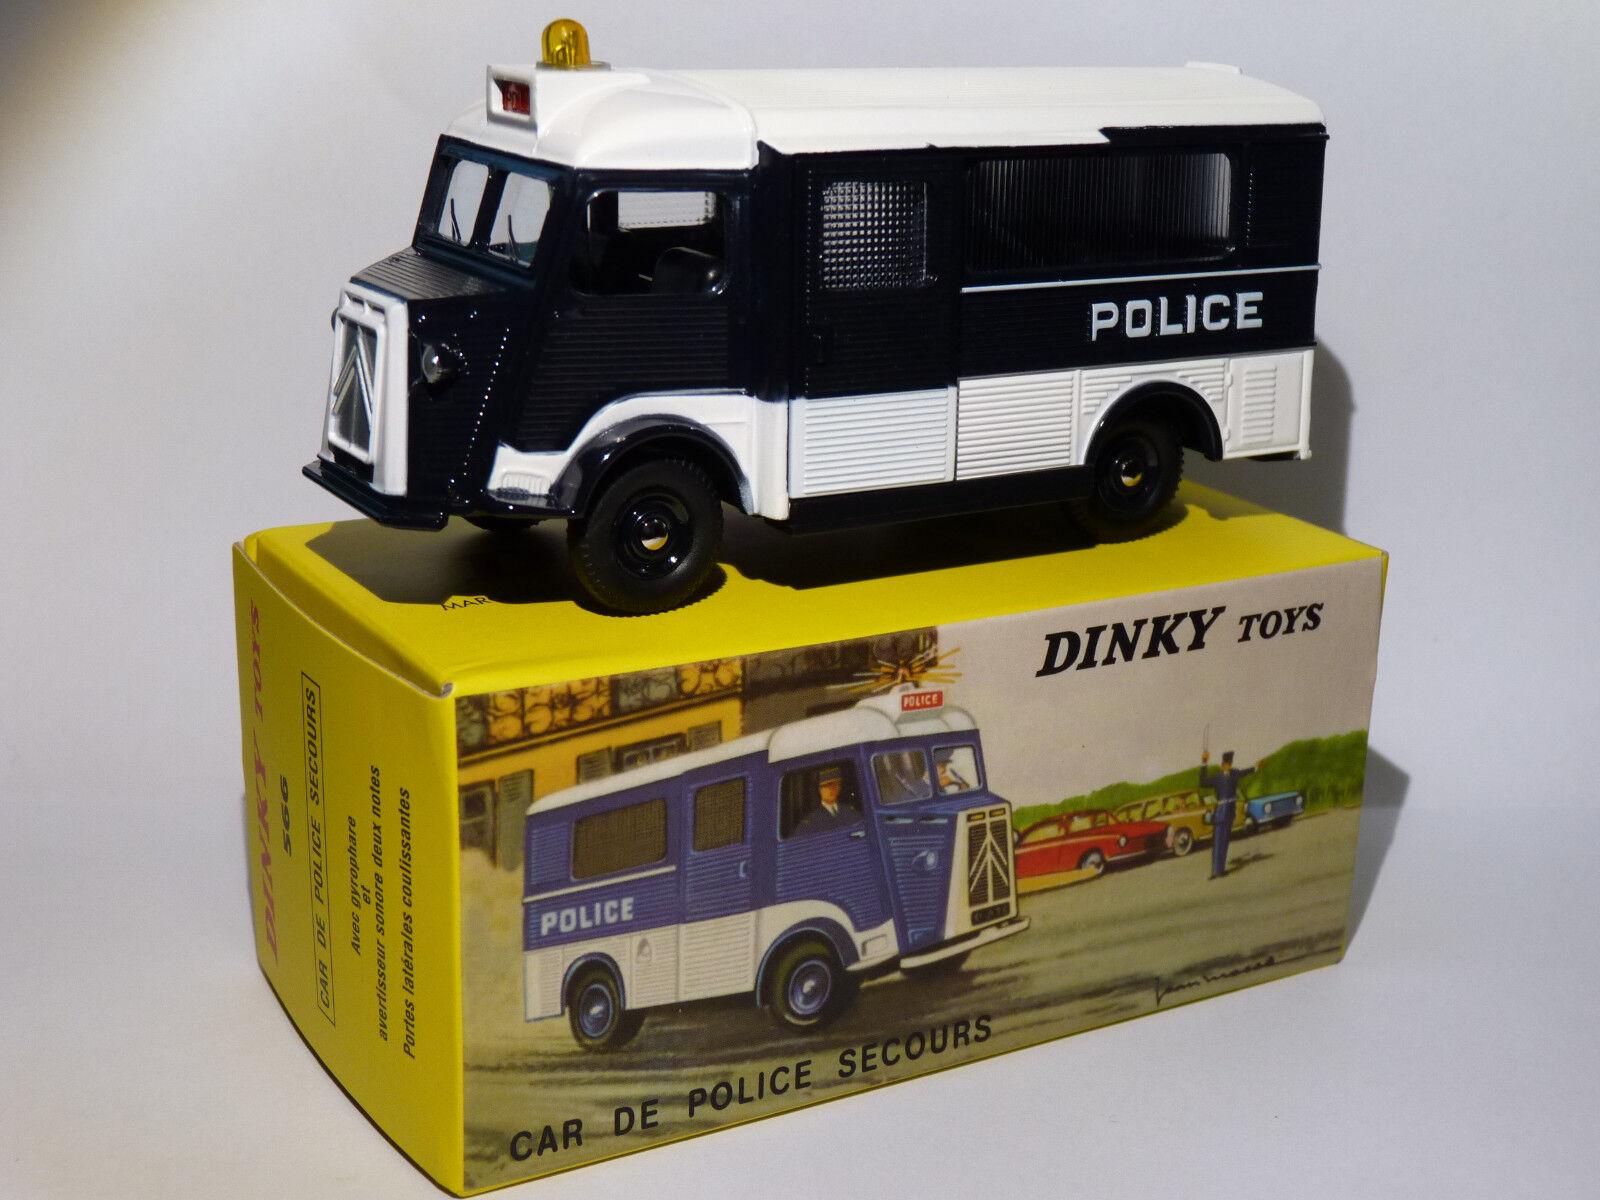 Citroen HY A causa delle Polizia scorta - réf 566 au 1/43 di dinky toys atlas